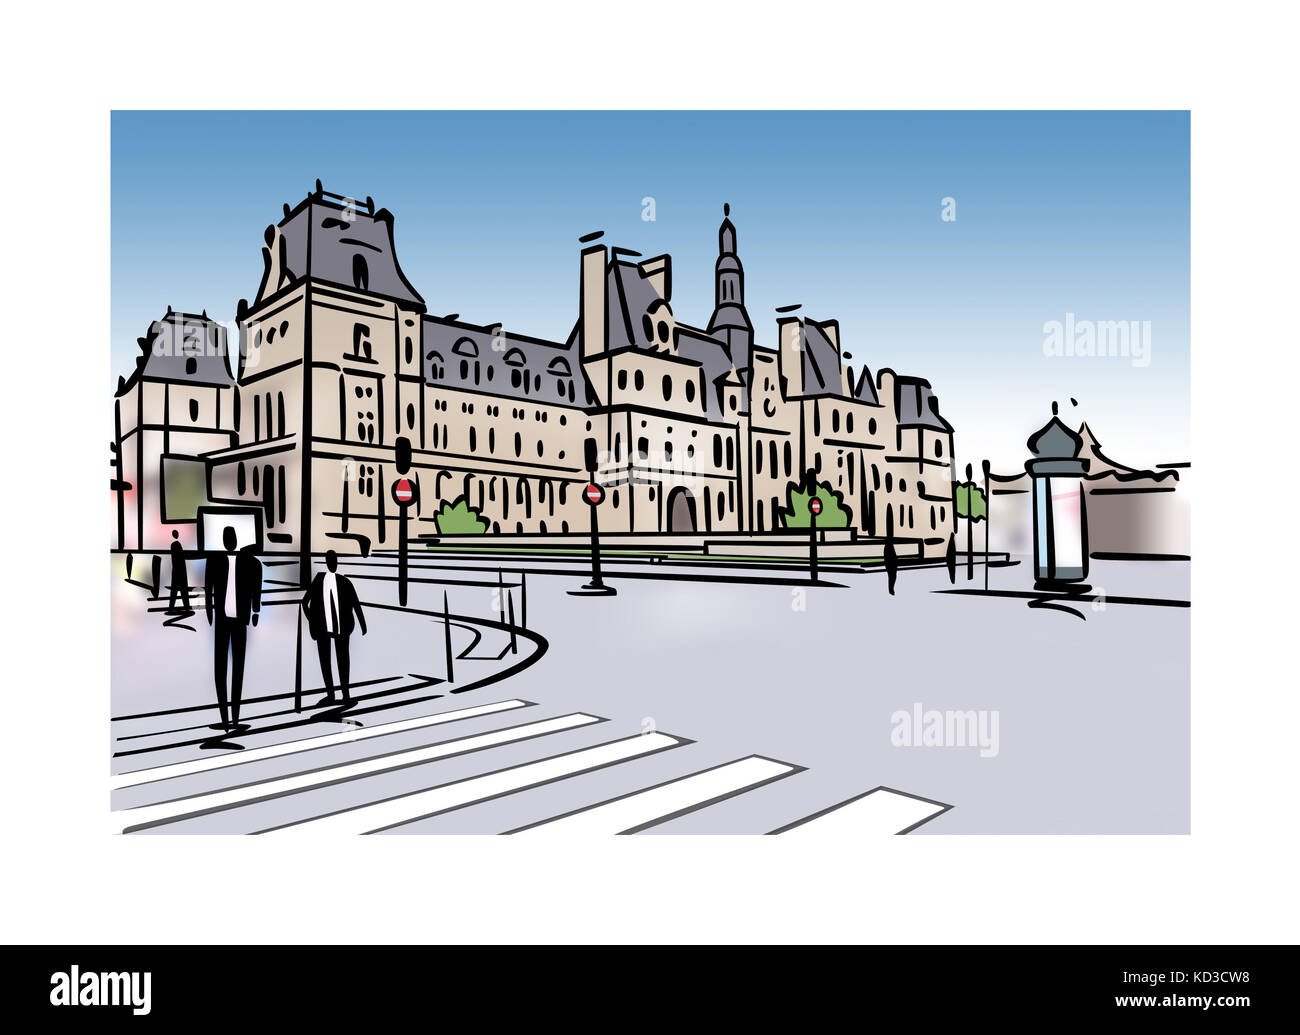 Illlustration des Hotel de Ville in Paris, Frankreich Stockfoto